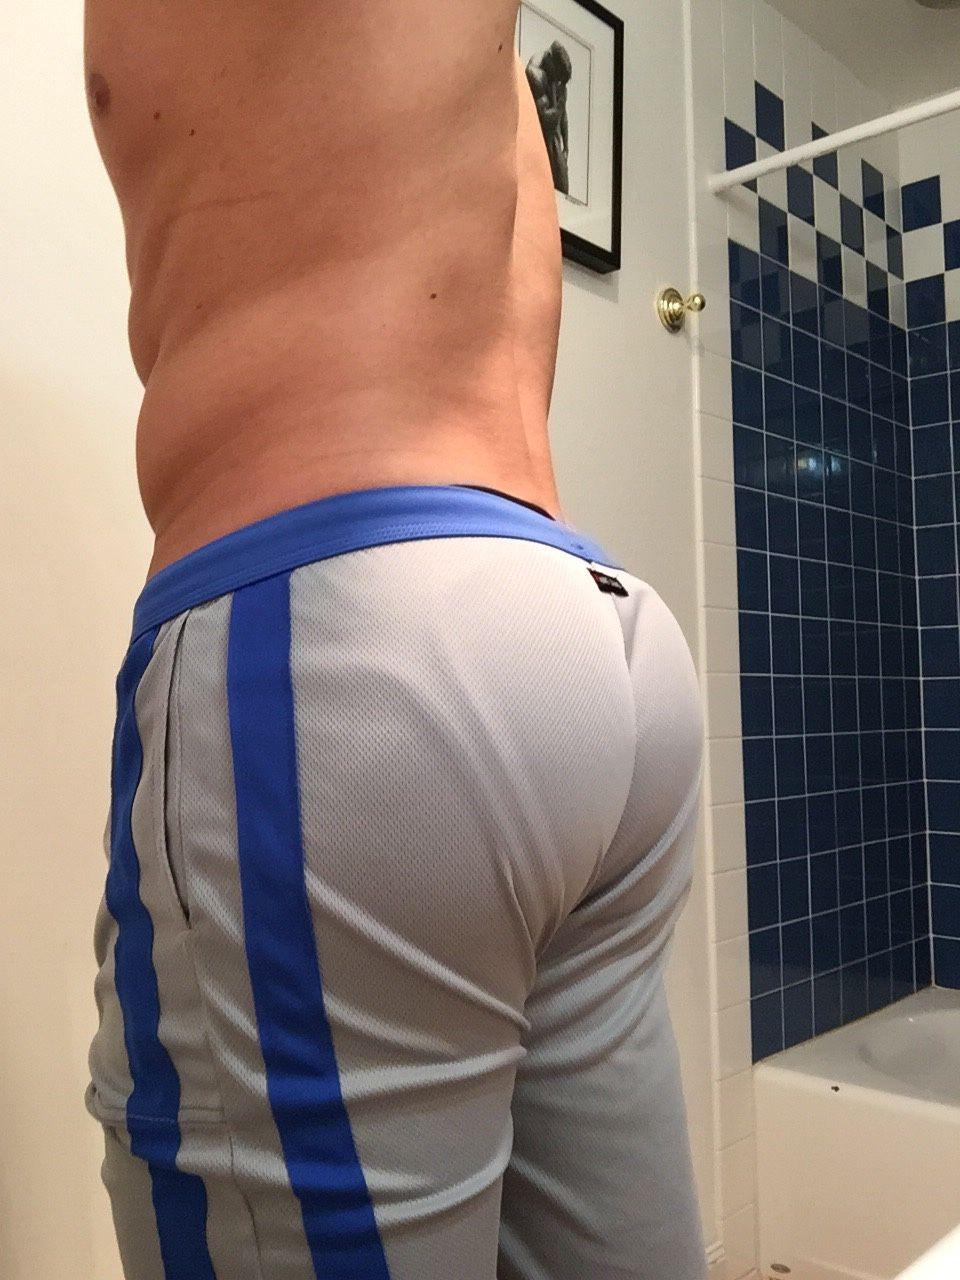 Tumblr gay butt